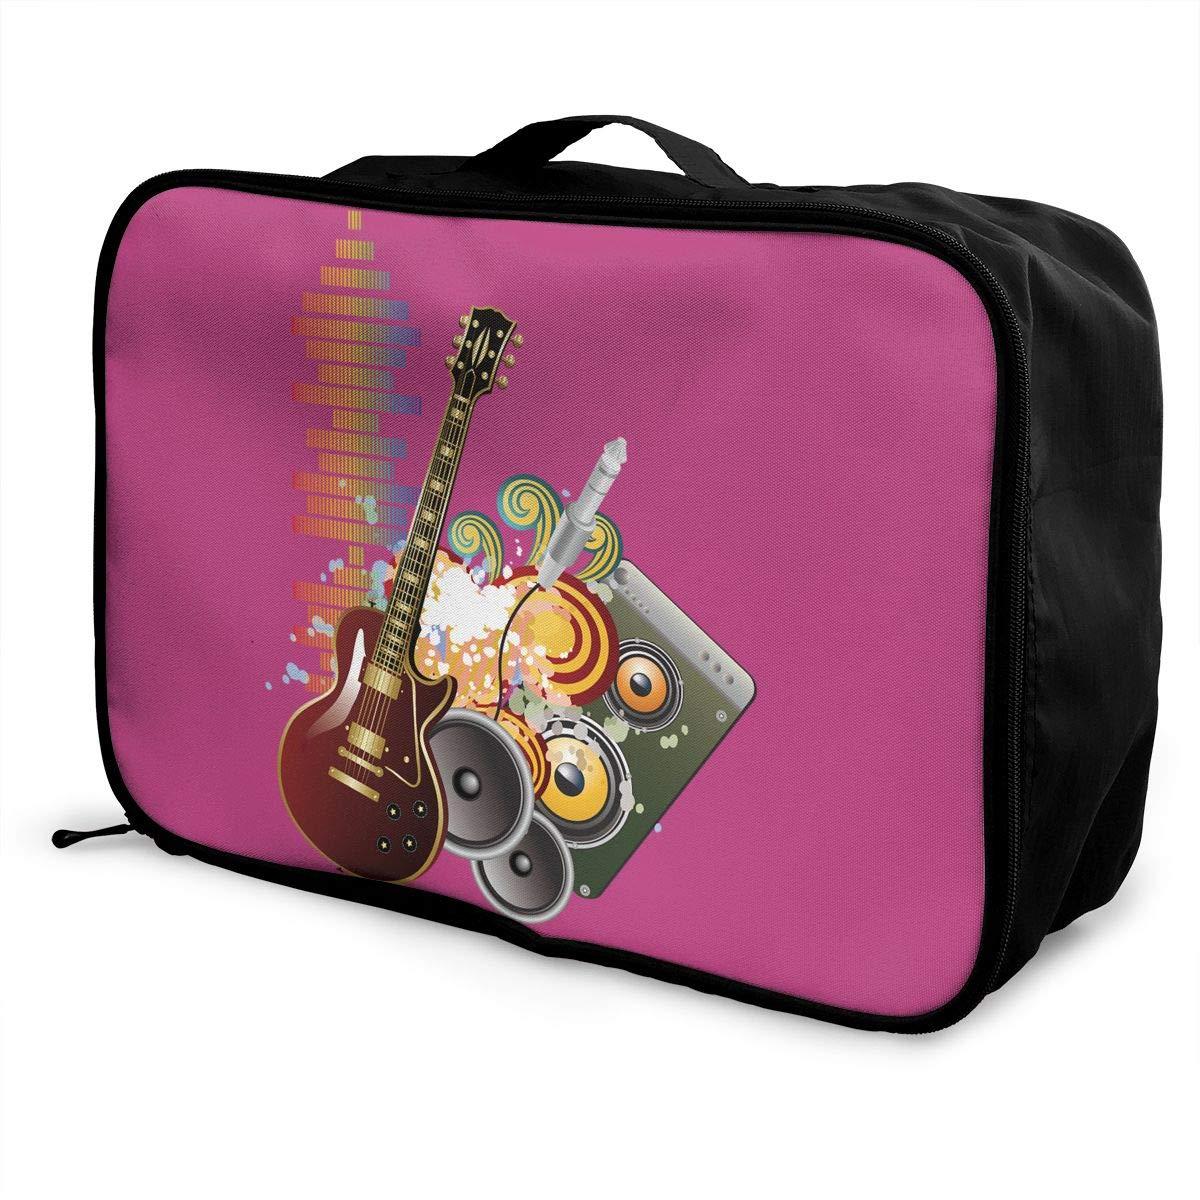 Travel Luggage Duffle Bag Lightweight Portable Handbag Banana Tree Leaves Large Capacity Waterproof Foldable Storage Tote